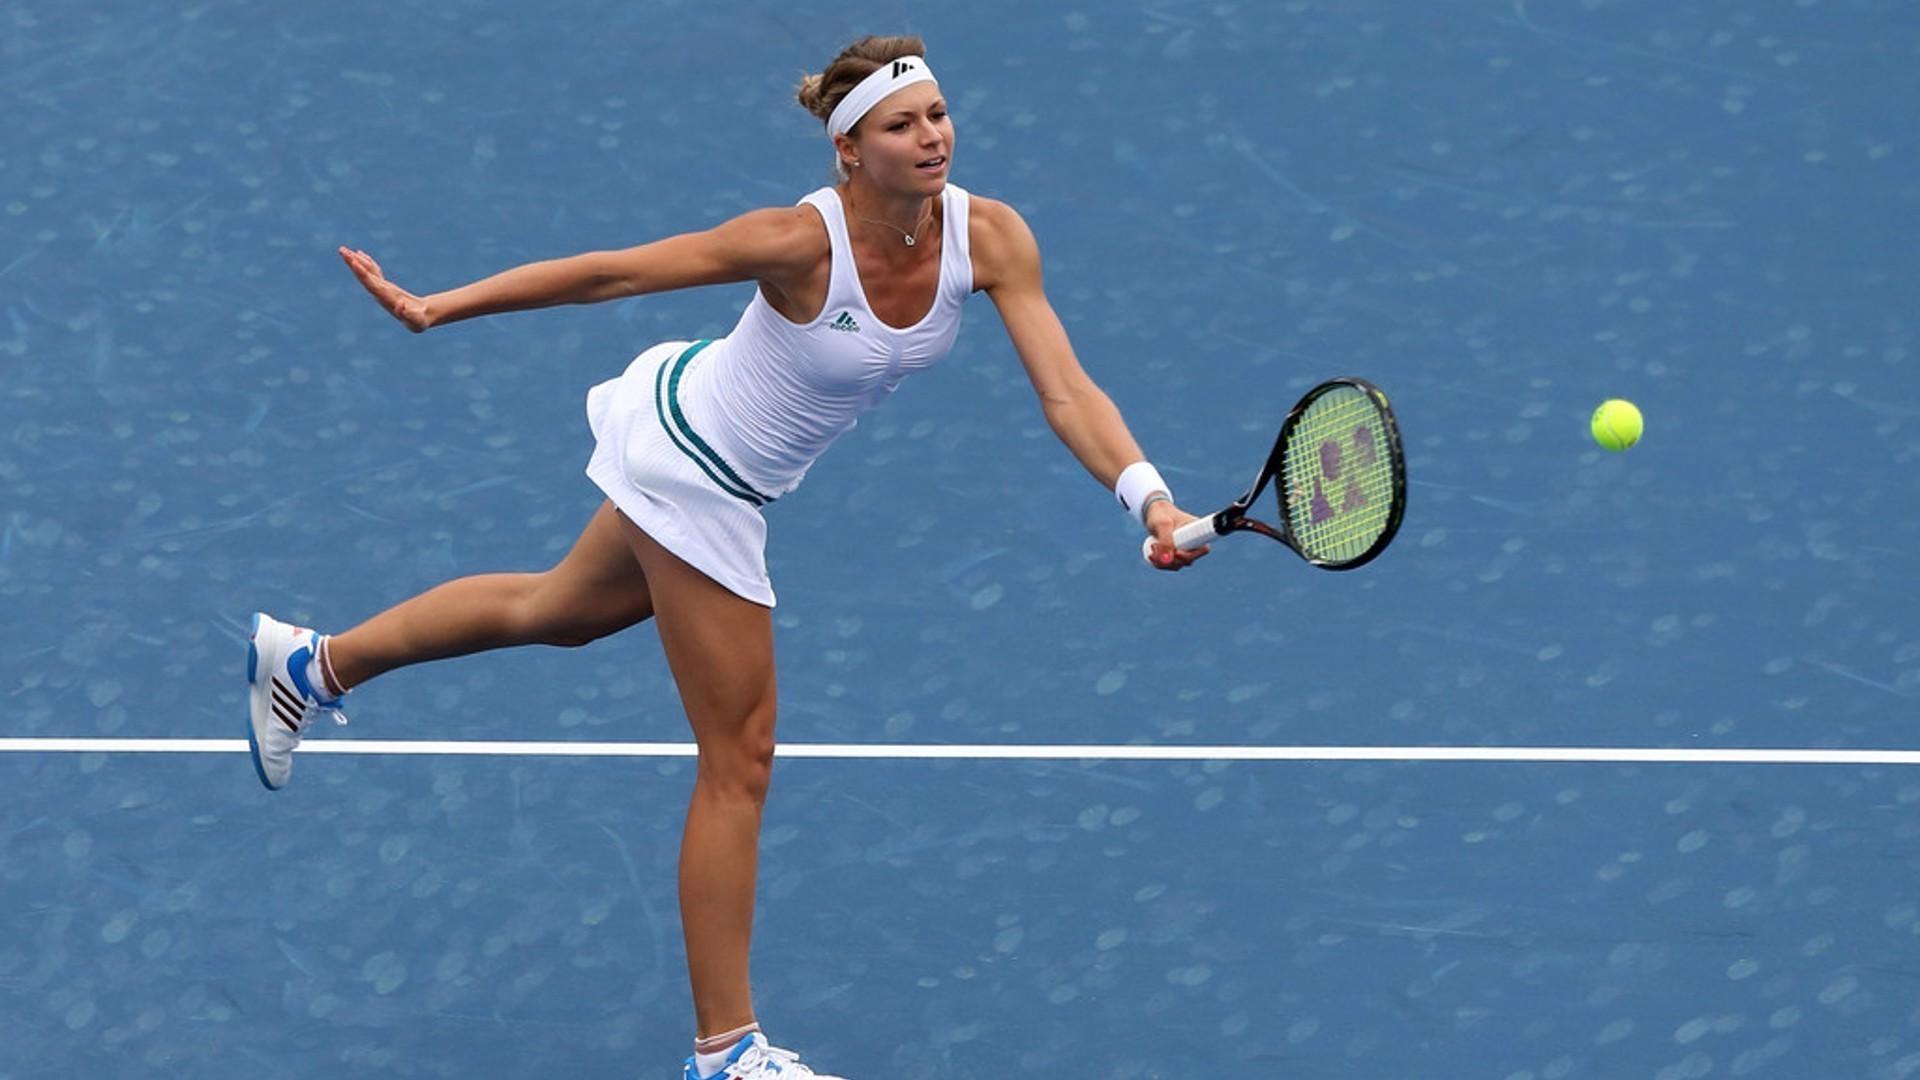 Maria Kirilenko, Tennis Rackets, Tennis Wallpapers HD / Desktop and Mobile  Backgrounds